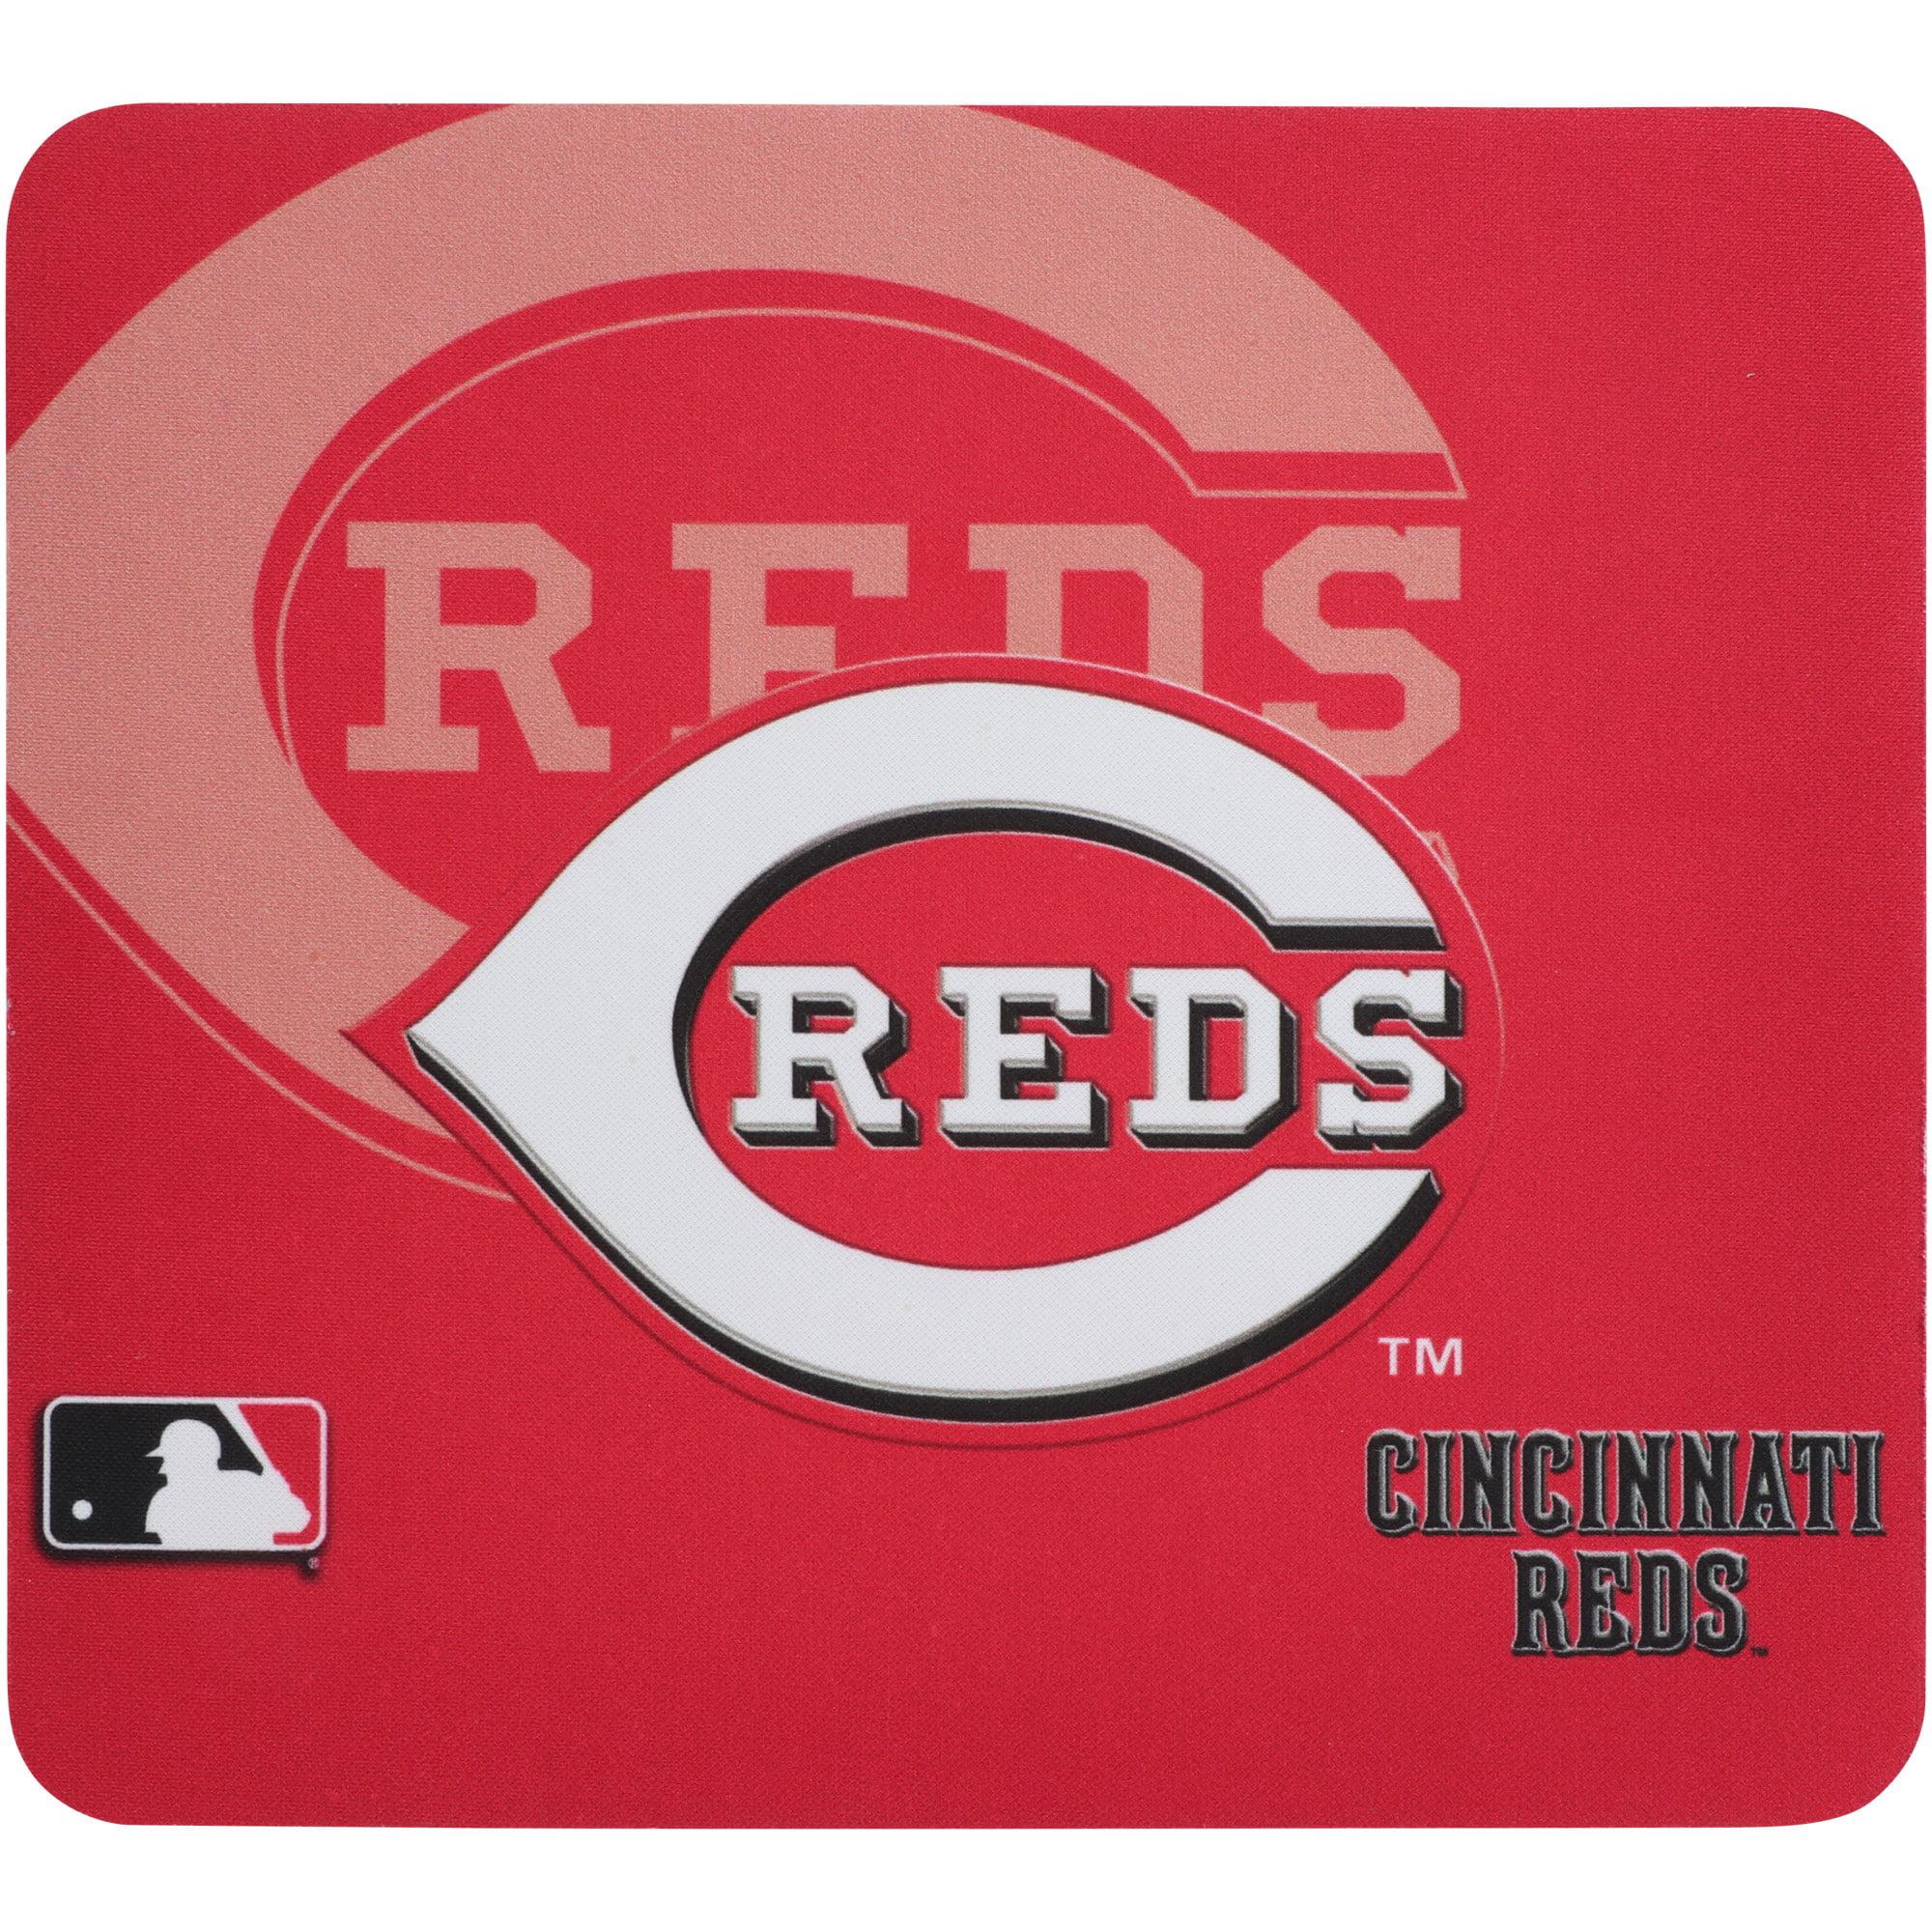 Cincinnati Reds 3D Mouse Pad - No Size